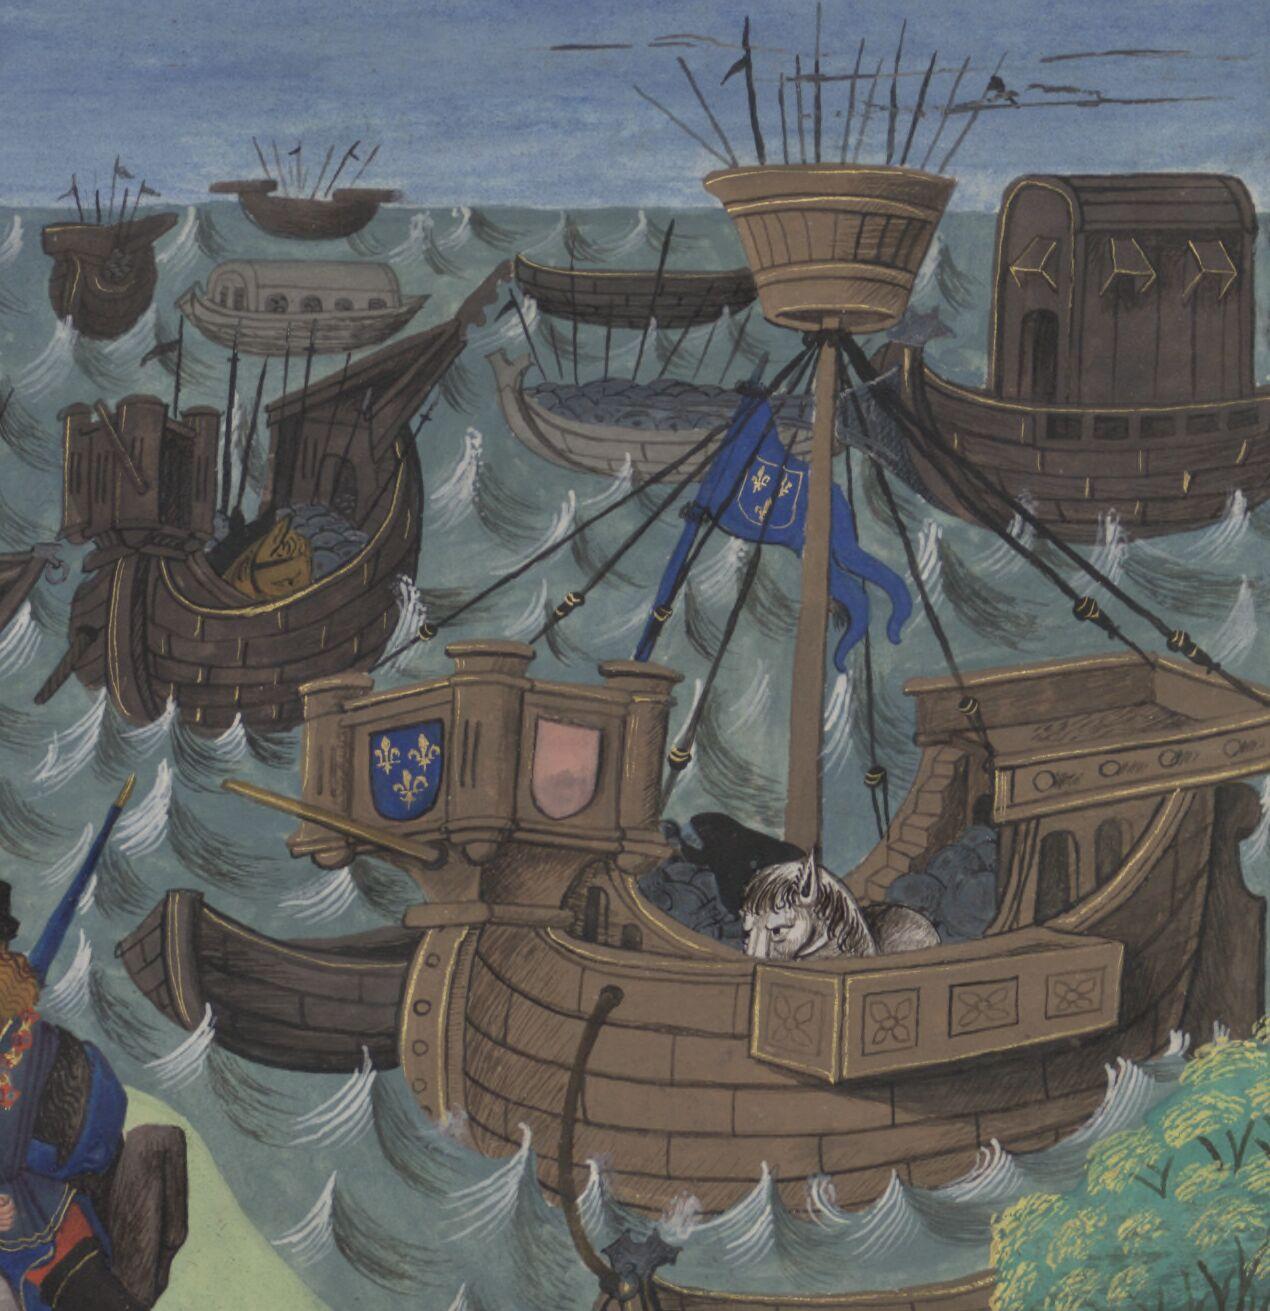 Horses in ships on choppy water